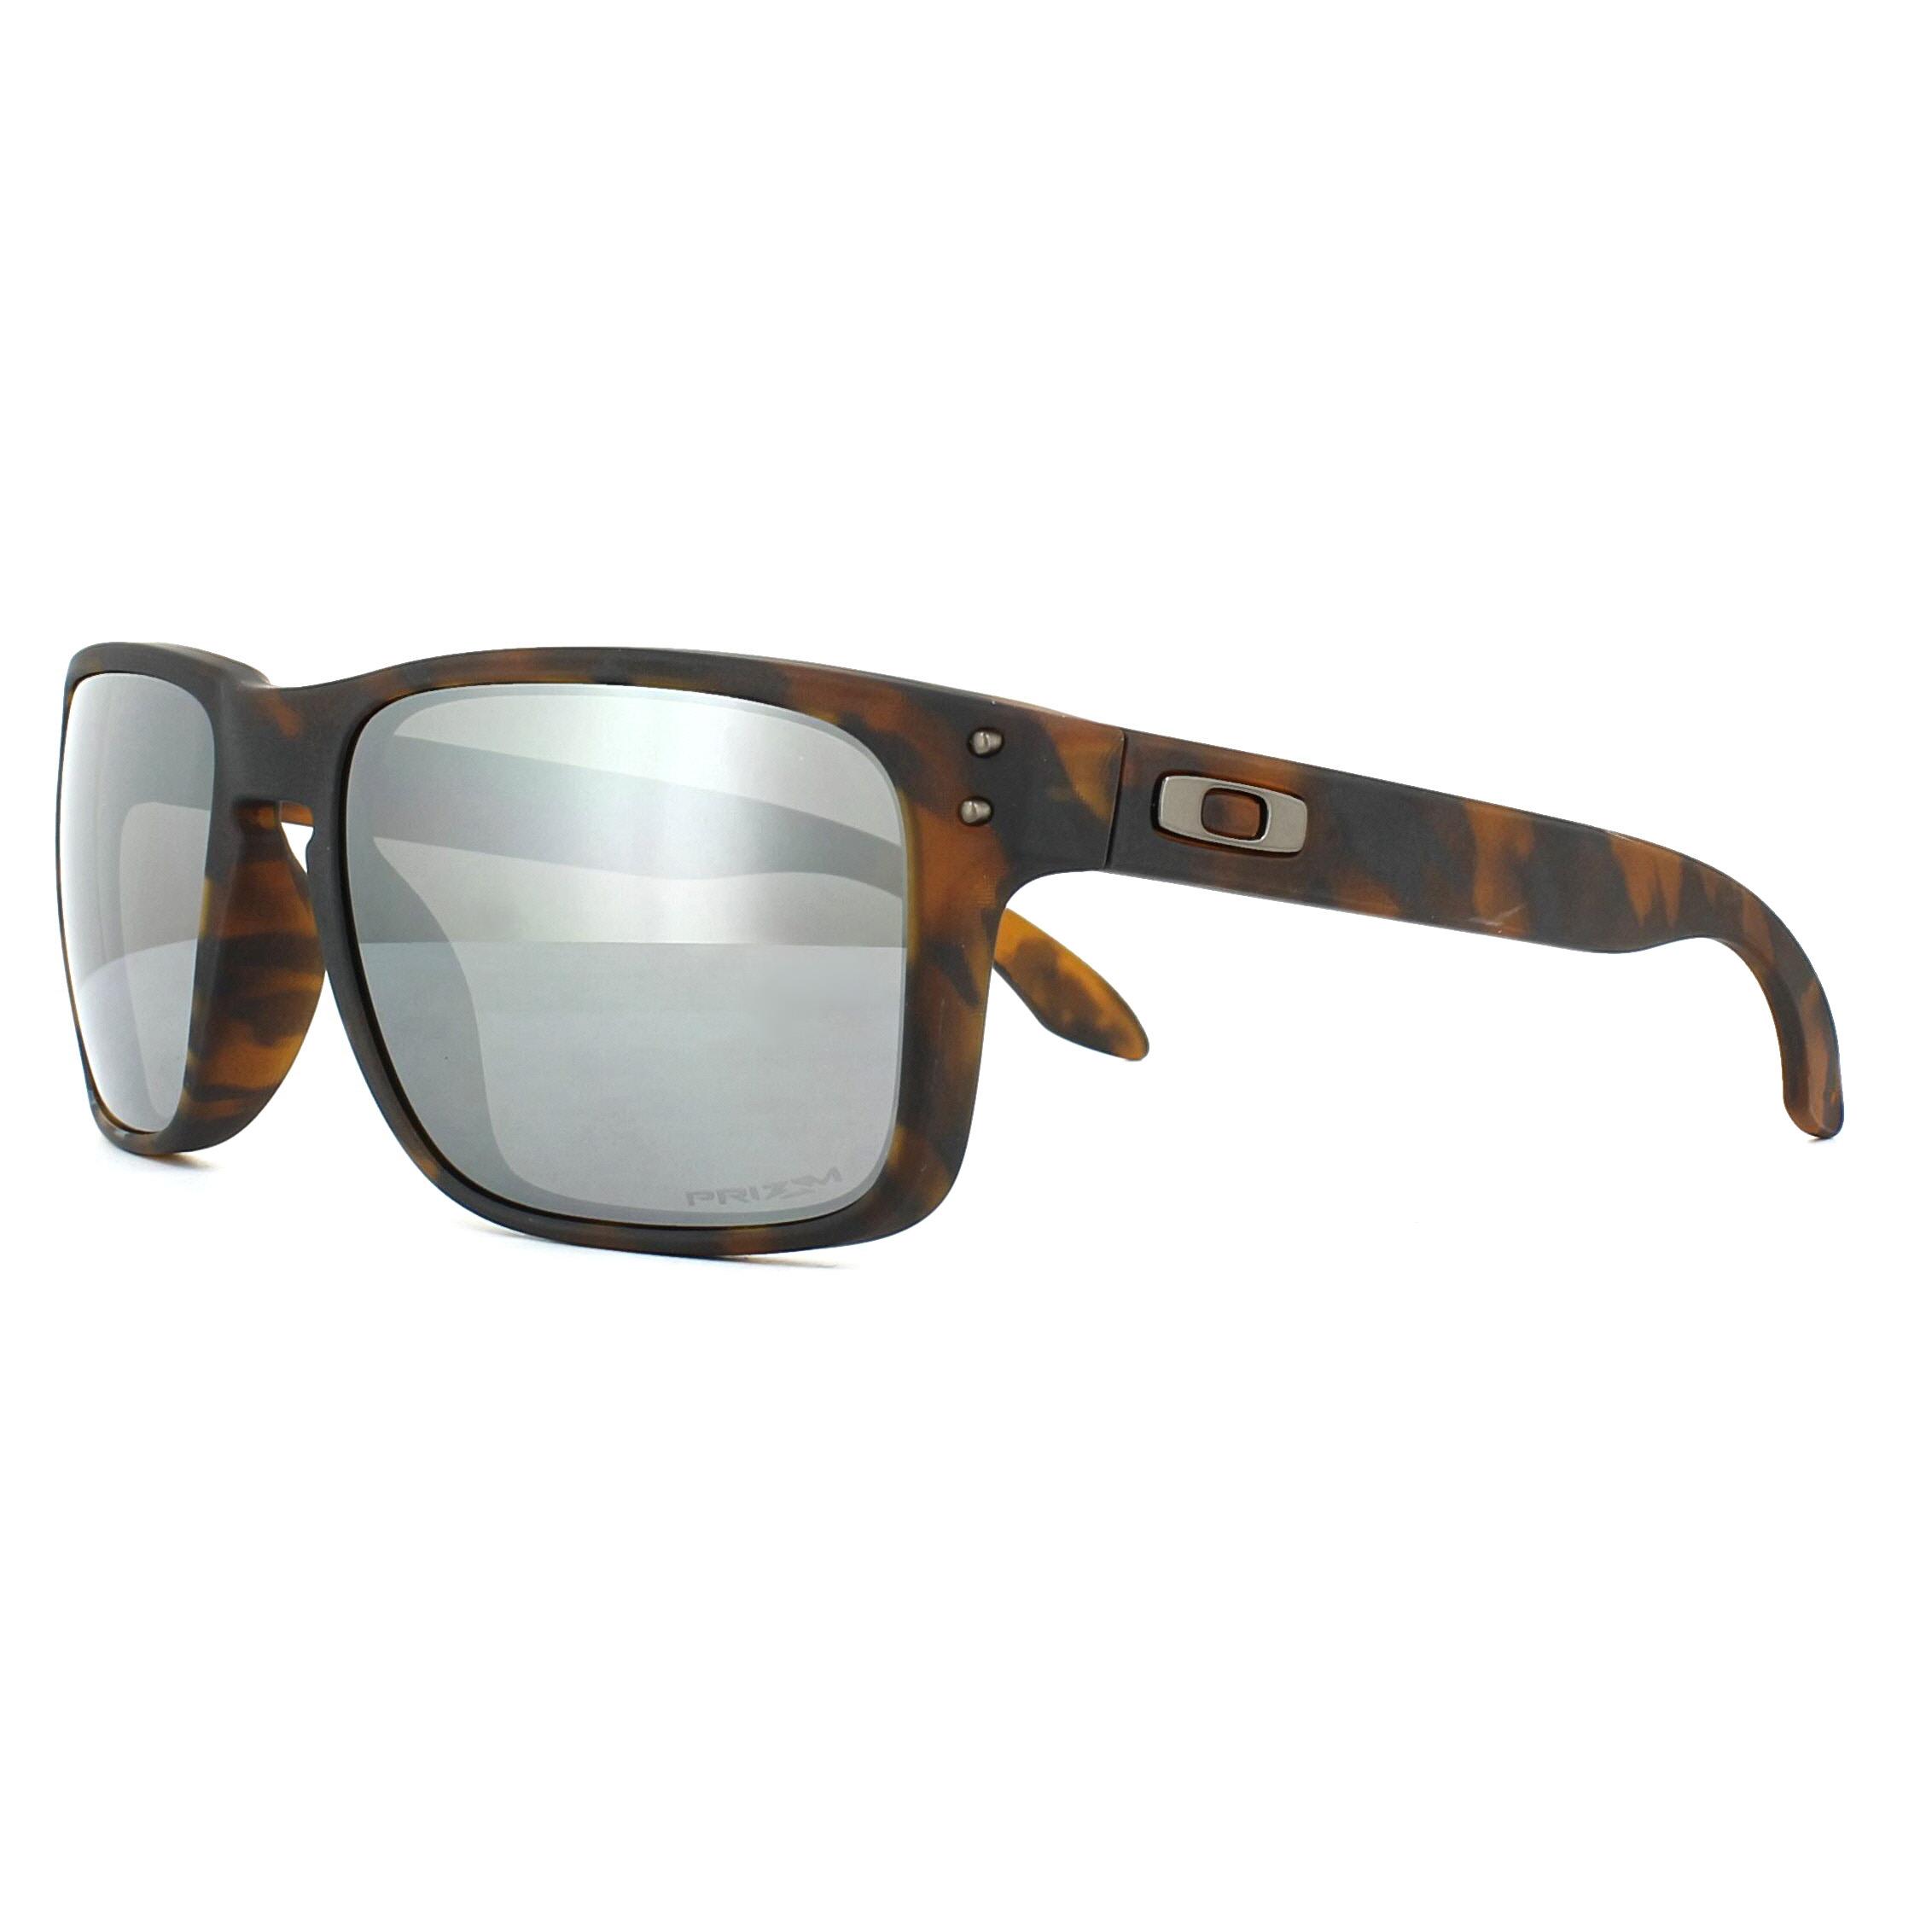 Oakley Sunglasses Holbrook OO9102-F4 Matt Brown Tortoise Prizm Black ... 62d5ab88a9